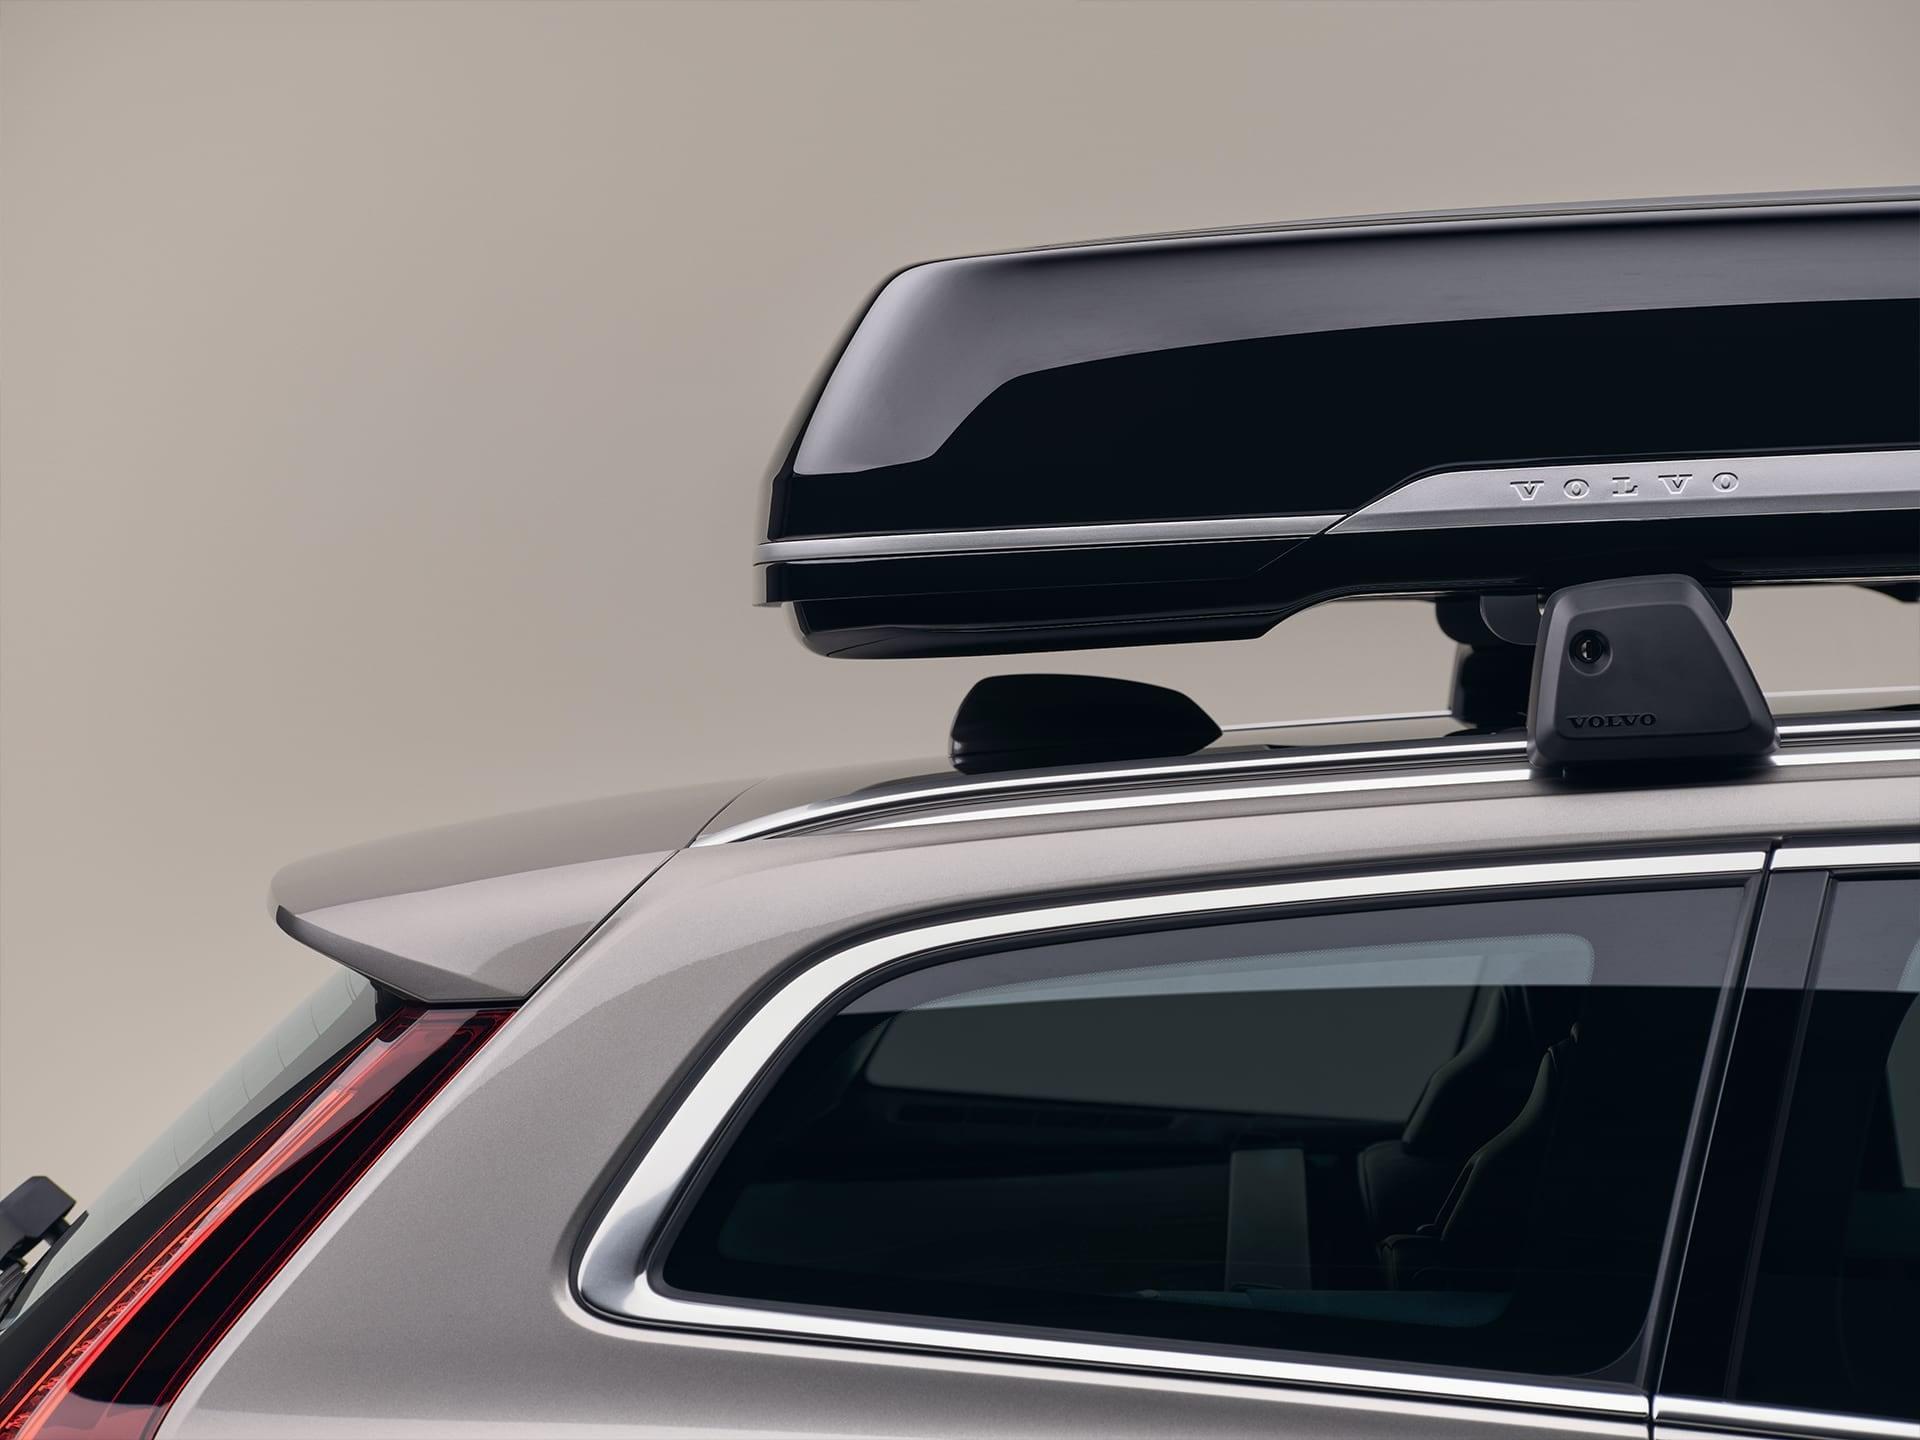 En Volvo V60 stationcar med tagboks.